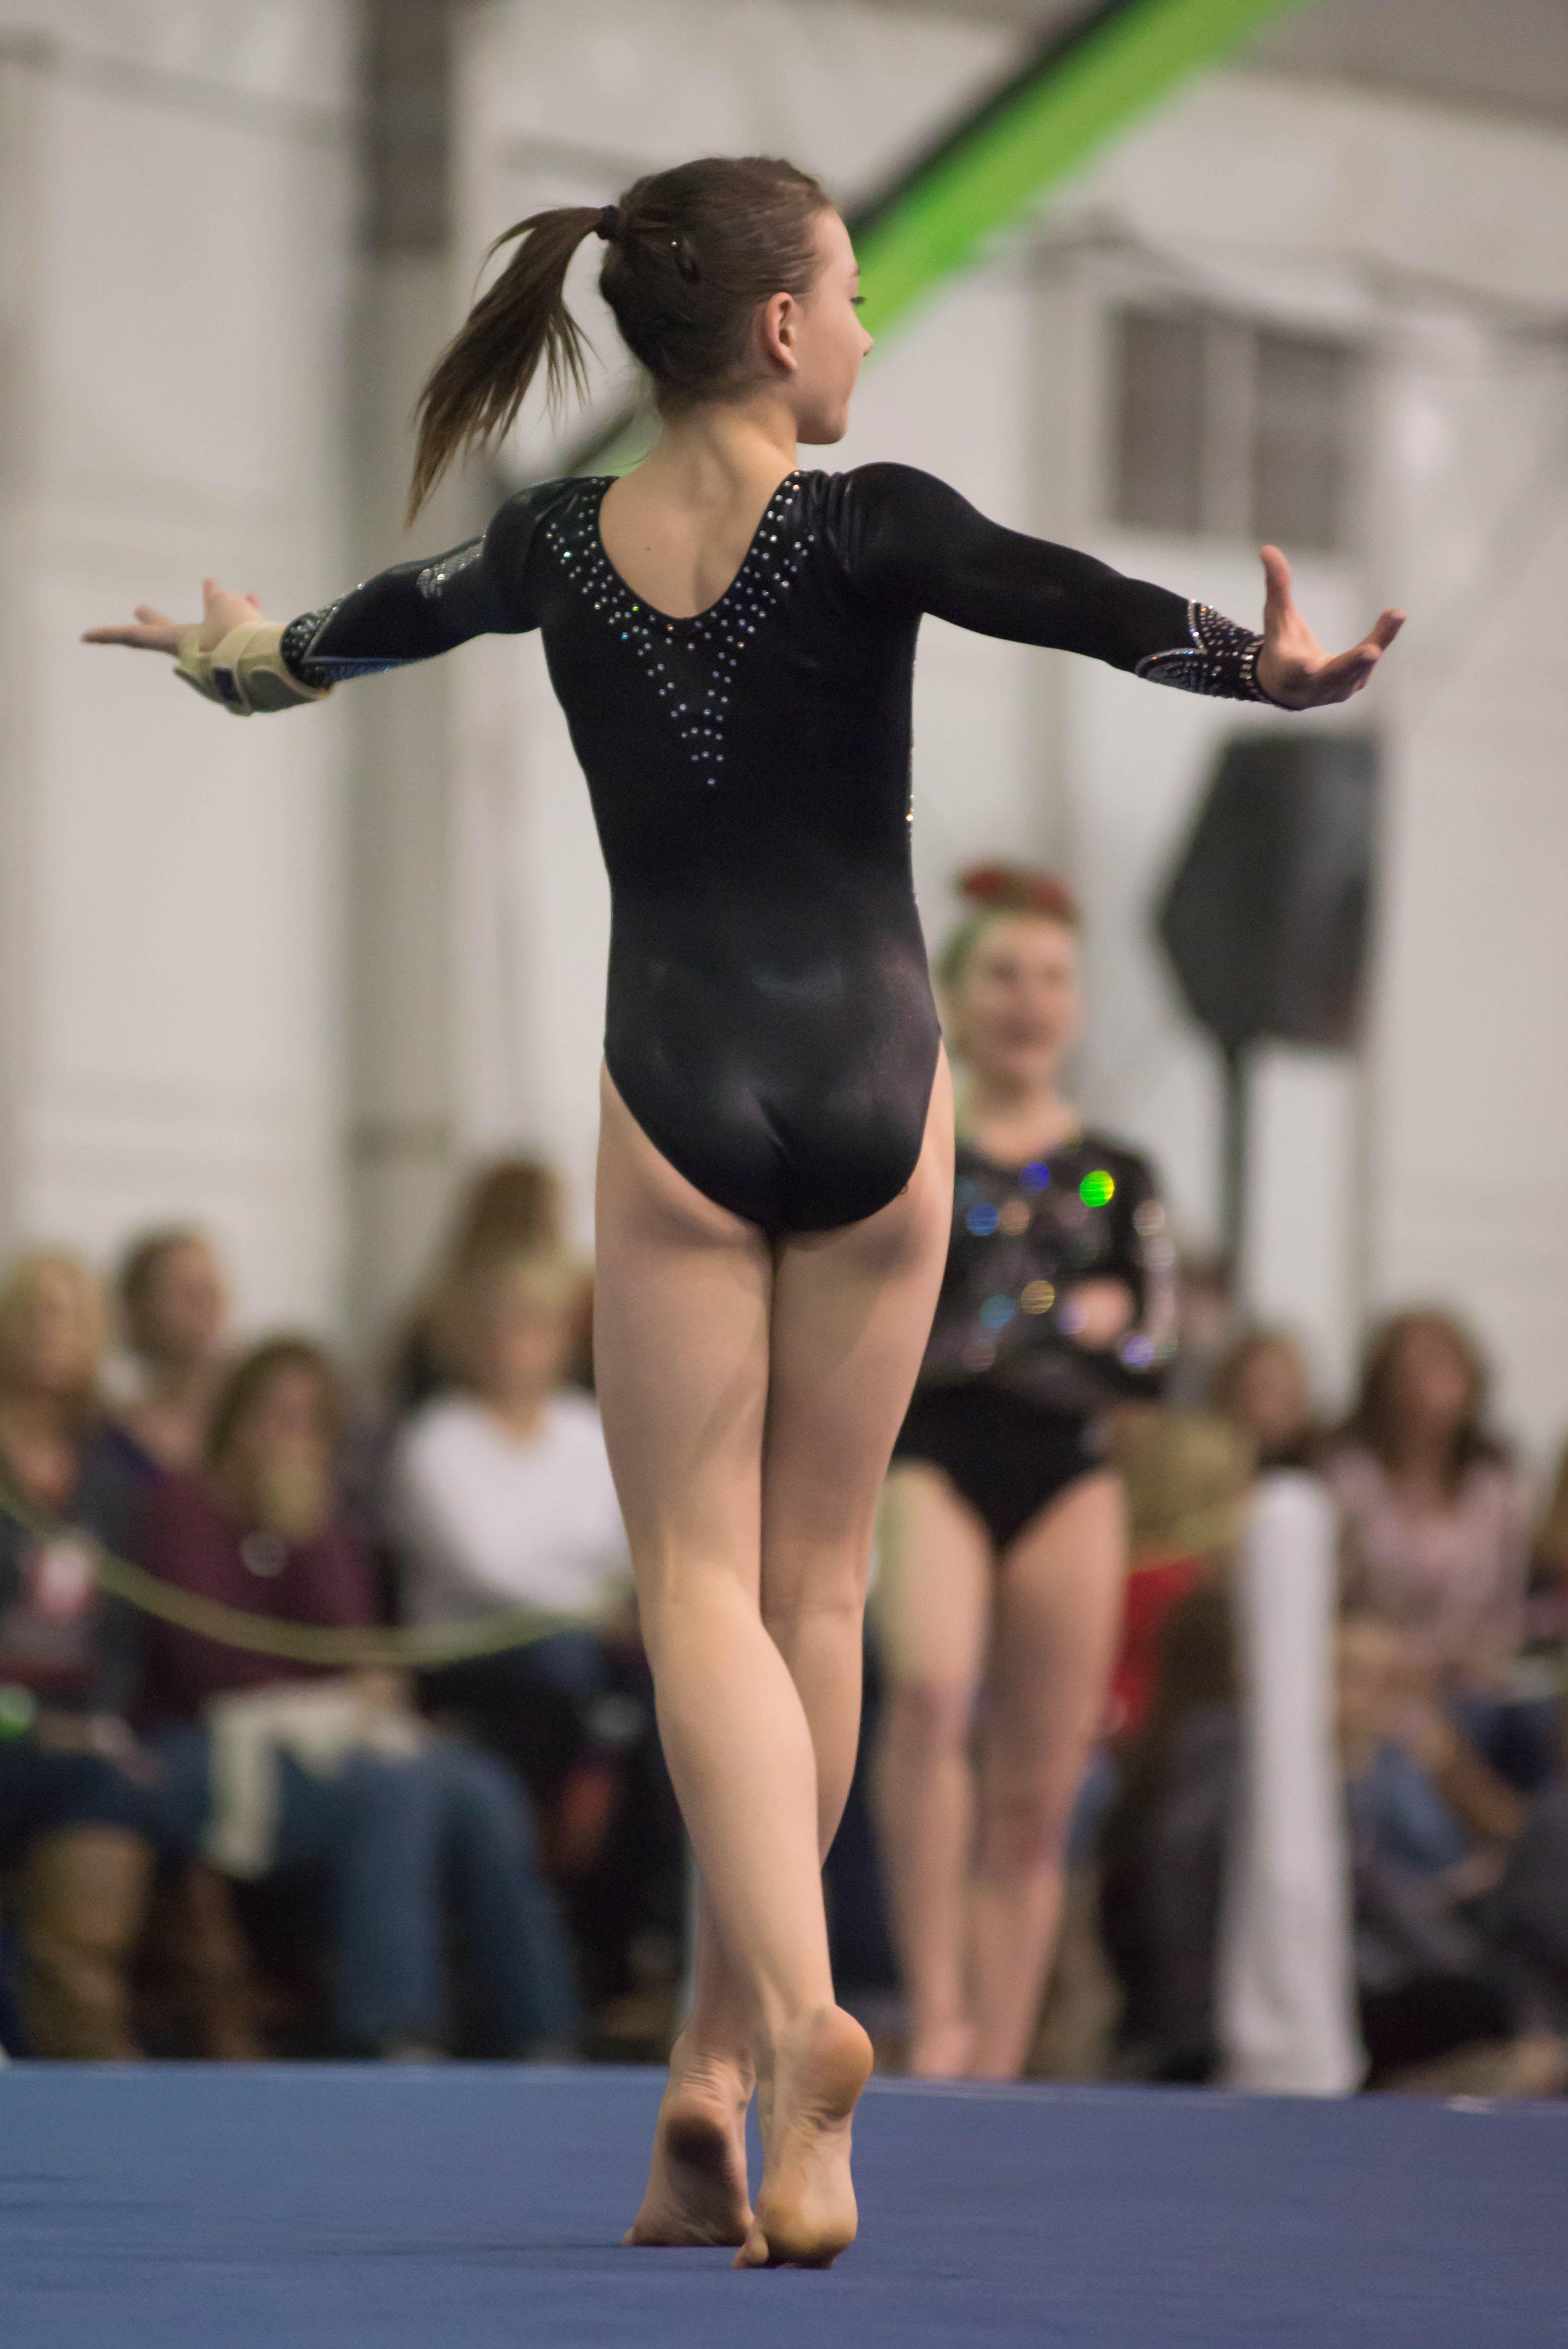 23715bea0255 Female gymnastics, resolution: 3109x4657, from Flickr Chollajack ...